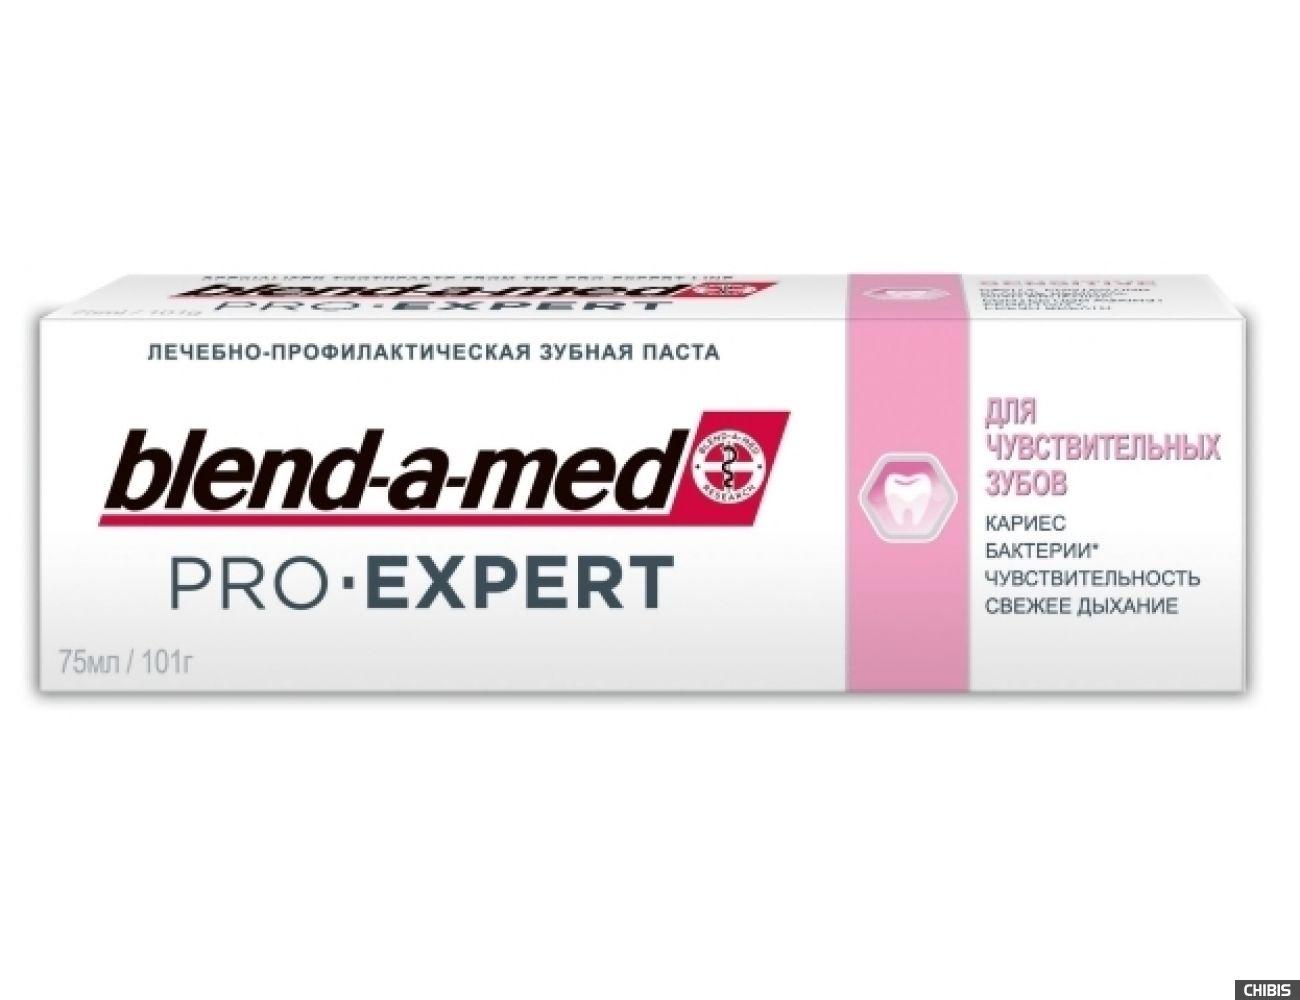 Зубная паста Blend-a-med Pro-Expert Sensitive Для чувствительных зубов 75 мл.(5011321700680)